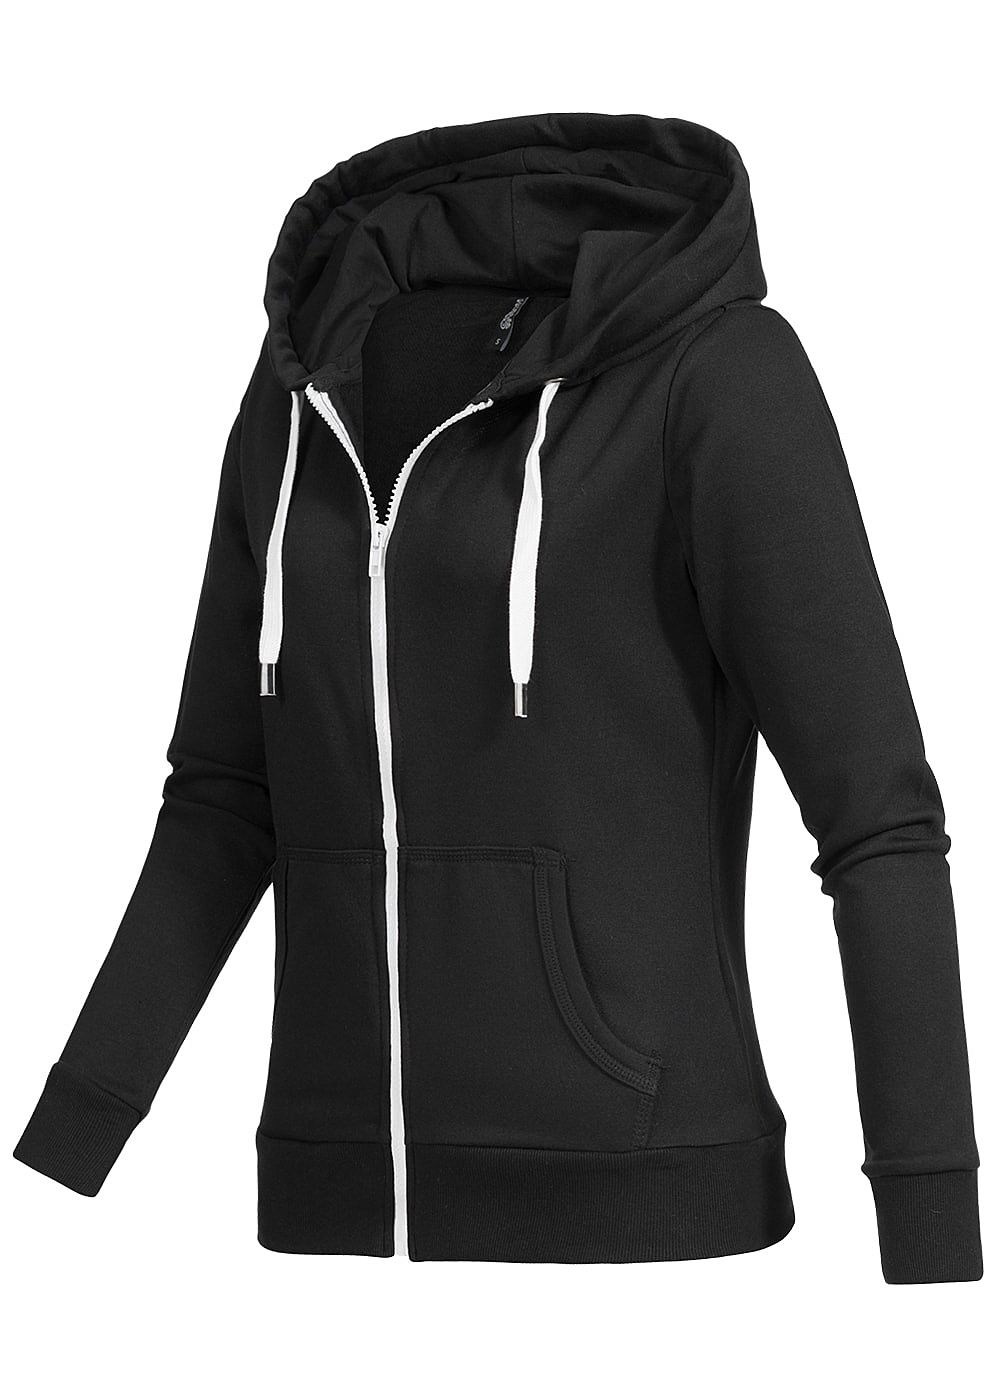 seventyseven lifestyle damen zip hoodie kapuze 2 taschen kordelzug schwarz weiss 77onlineshop. Black Bedroom Furniture Sets. Home Design Ideas